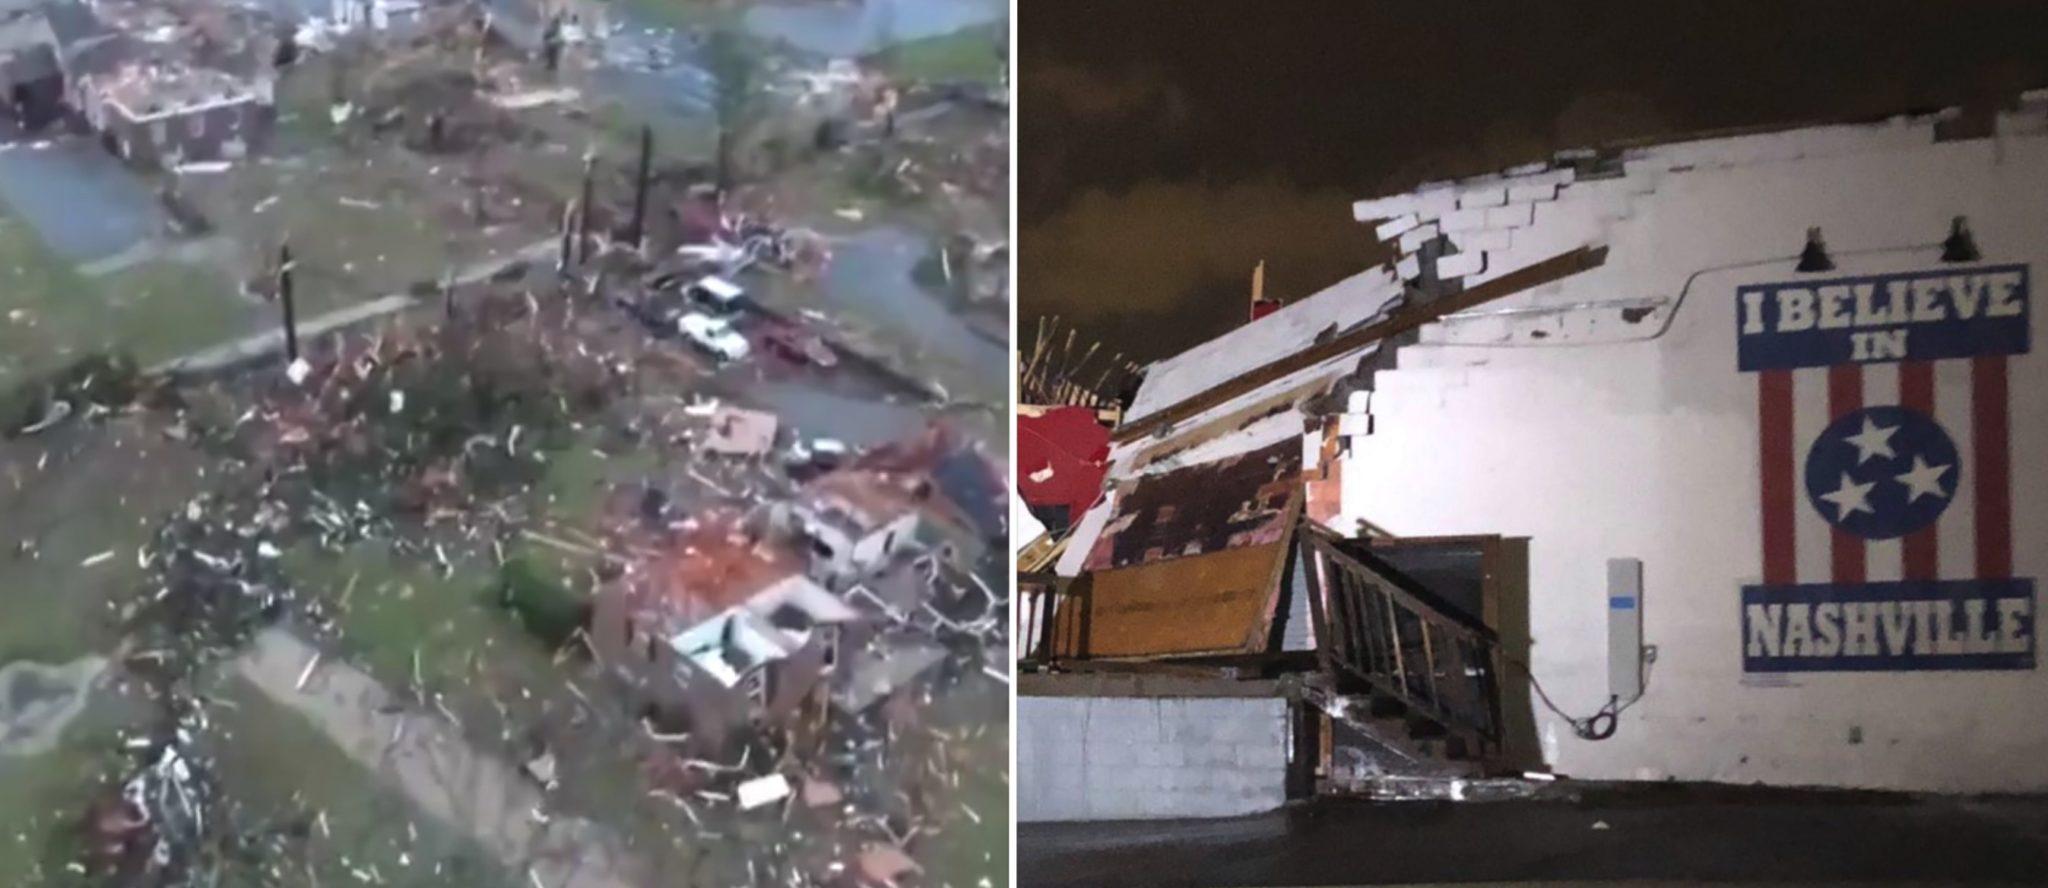 nashville-tornado2-scaled.jpg